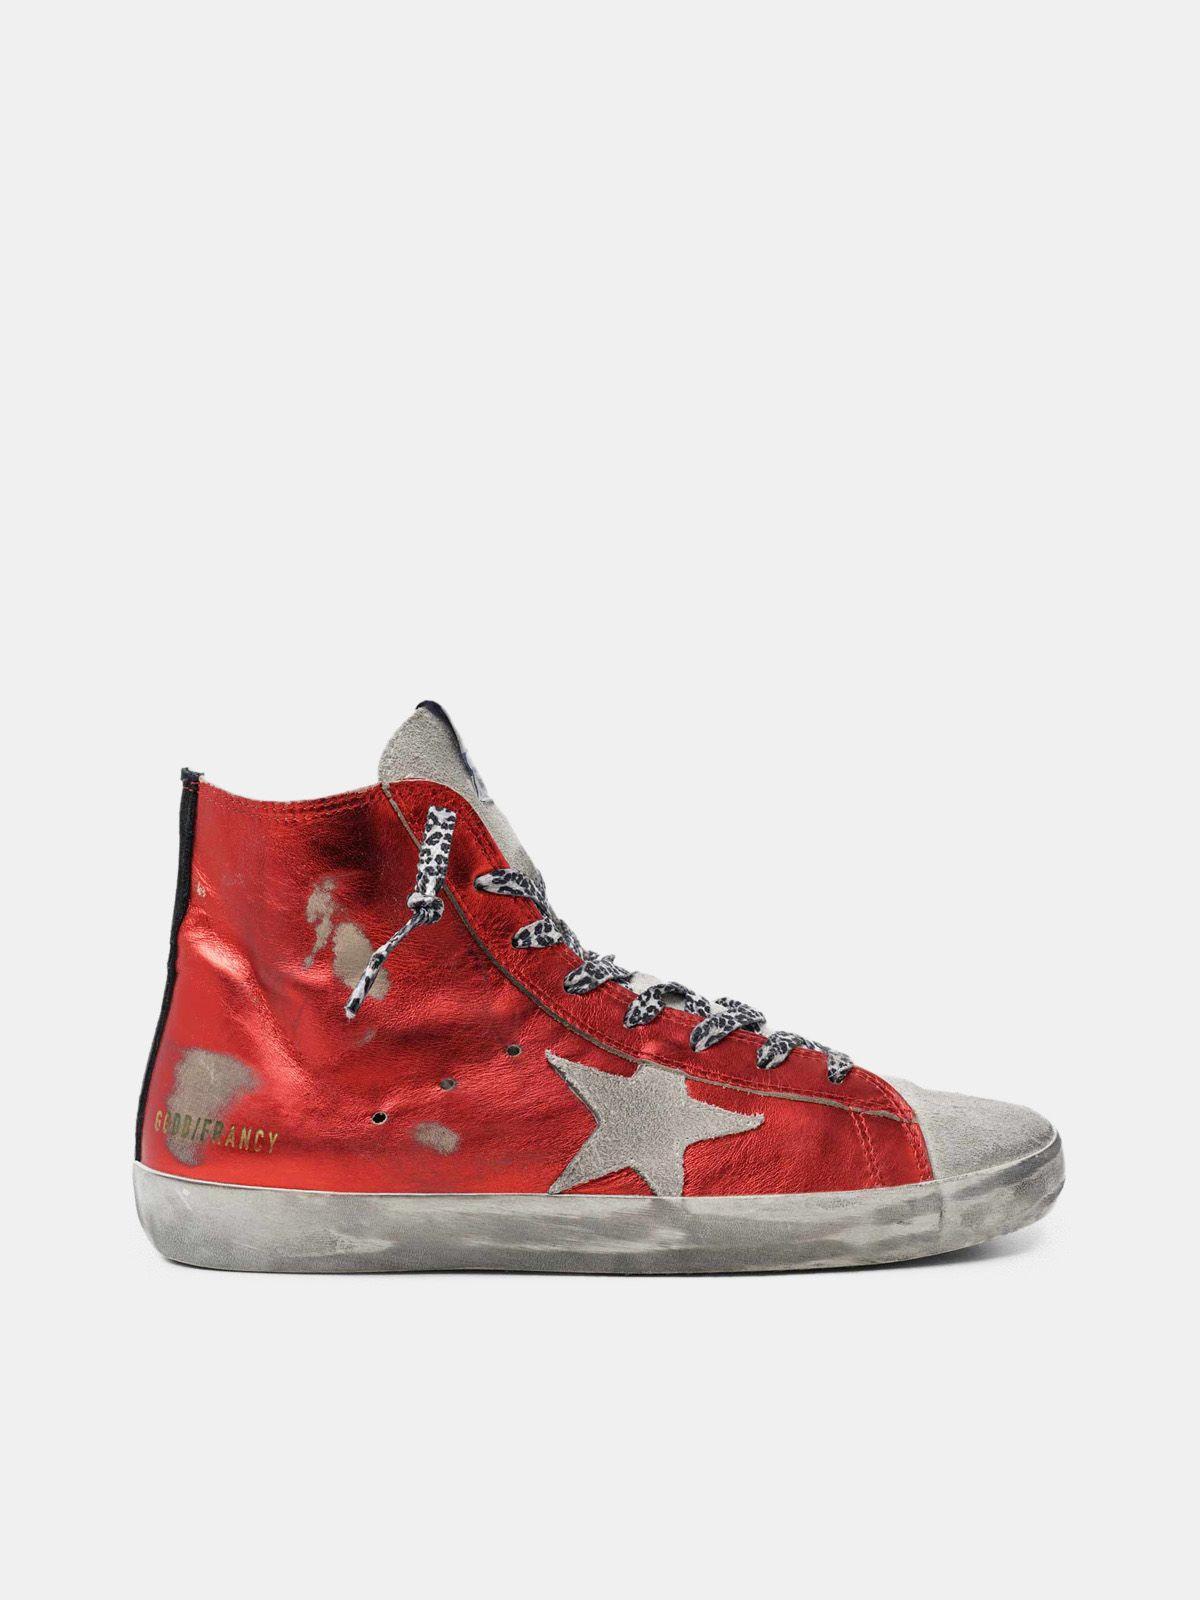 Golden Goose - Sneakers Francy in pelle rossa laminata e lacci leopardati in